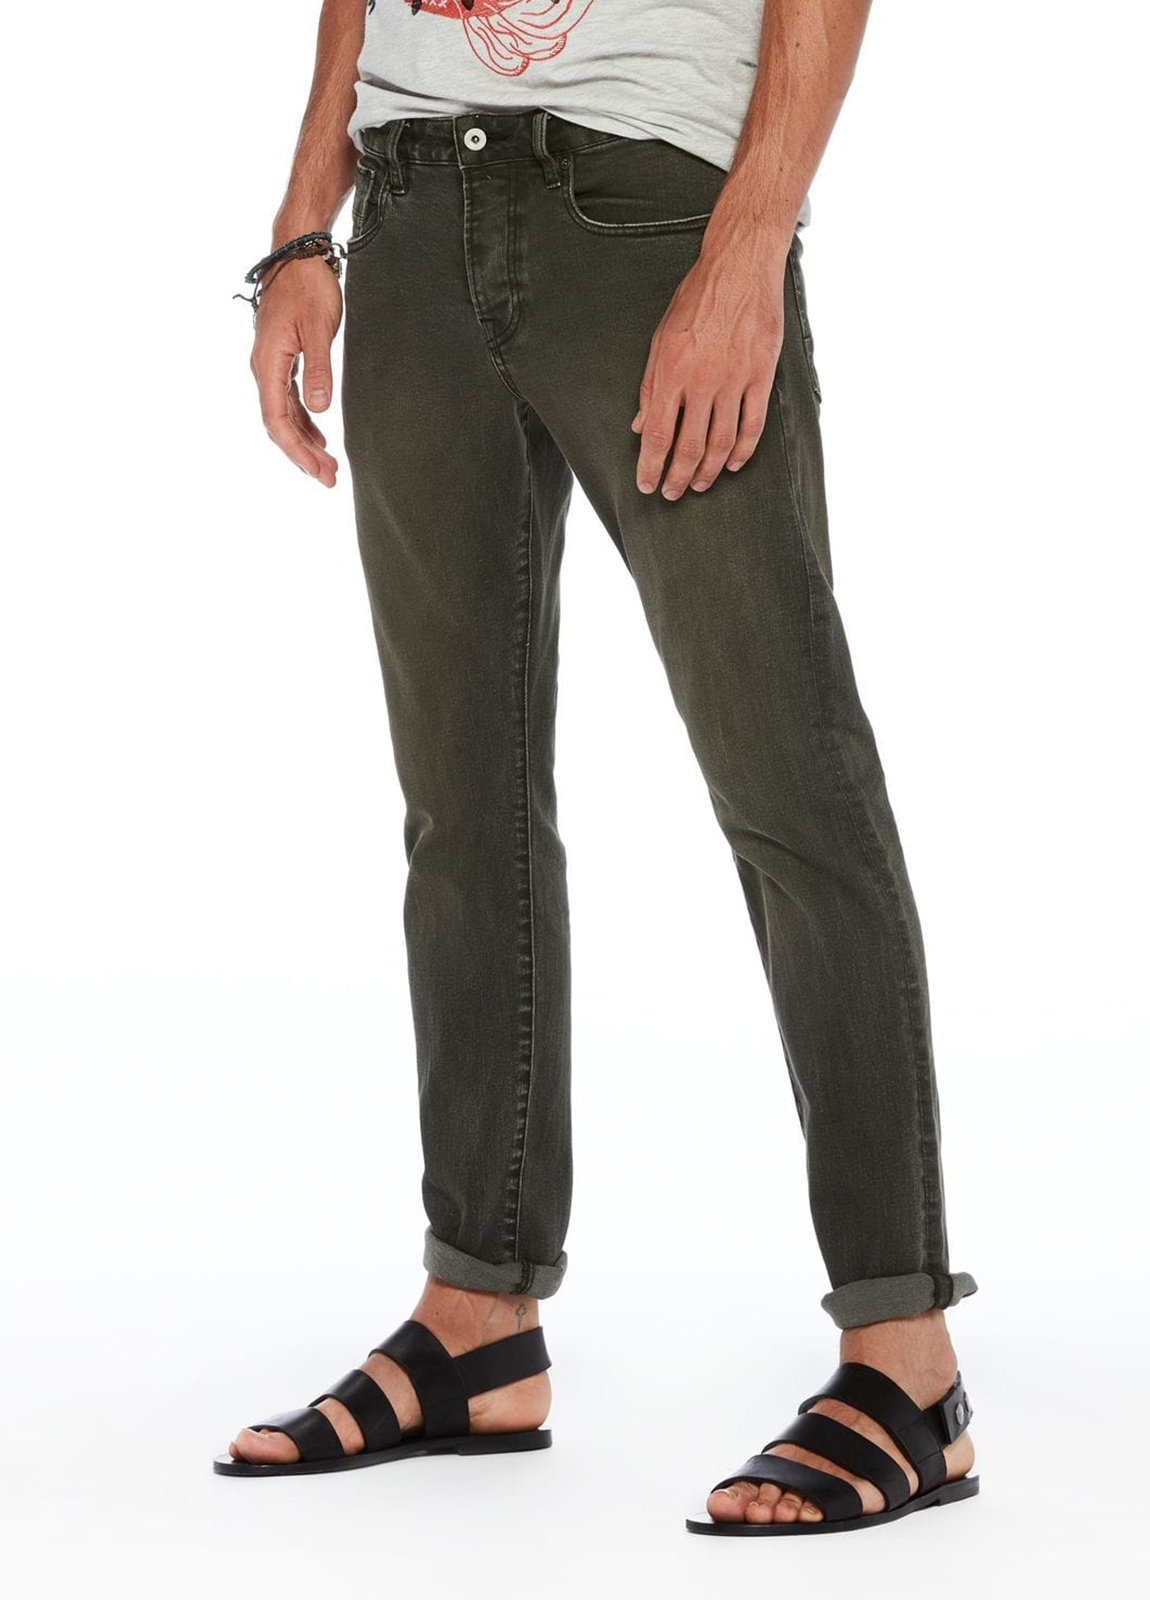 Pantalón 5 bolsillos regular slim fit modelo RALSTON denim elástico teñido en prenda color verde oscuro. 78% Algodón 21% Poliéster 1% Elastano. - Ítem2